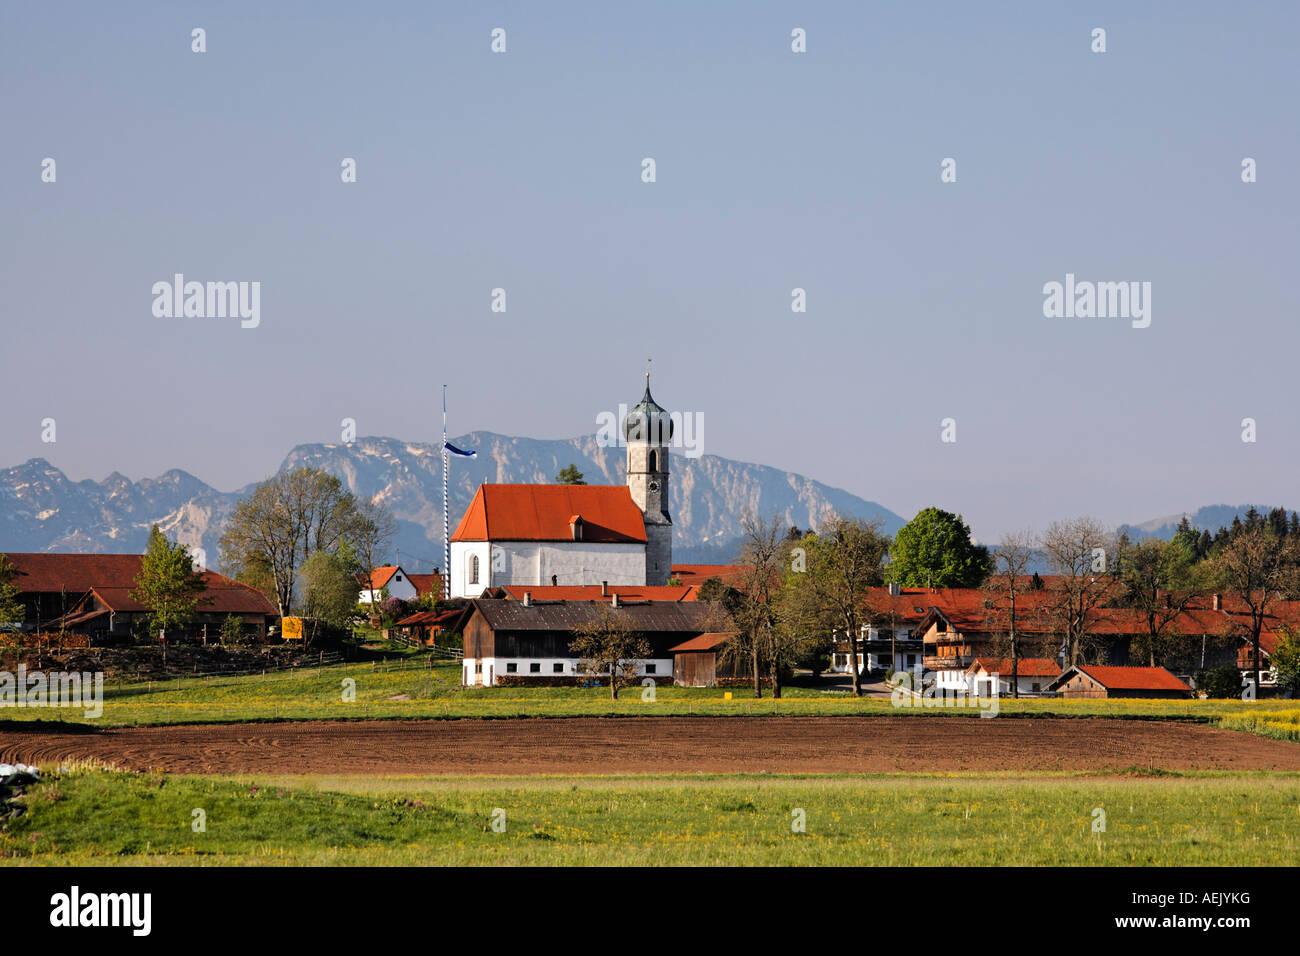 Dietramszell, Upper Bavaria, Germany - Stock Image